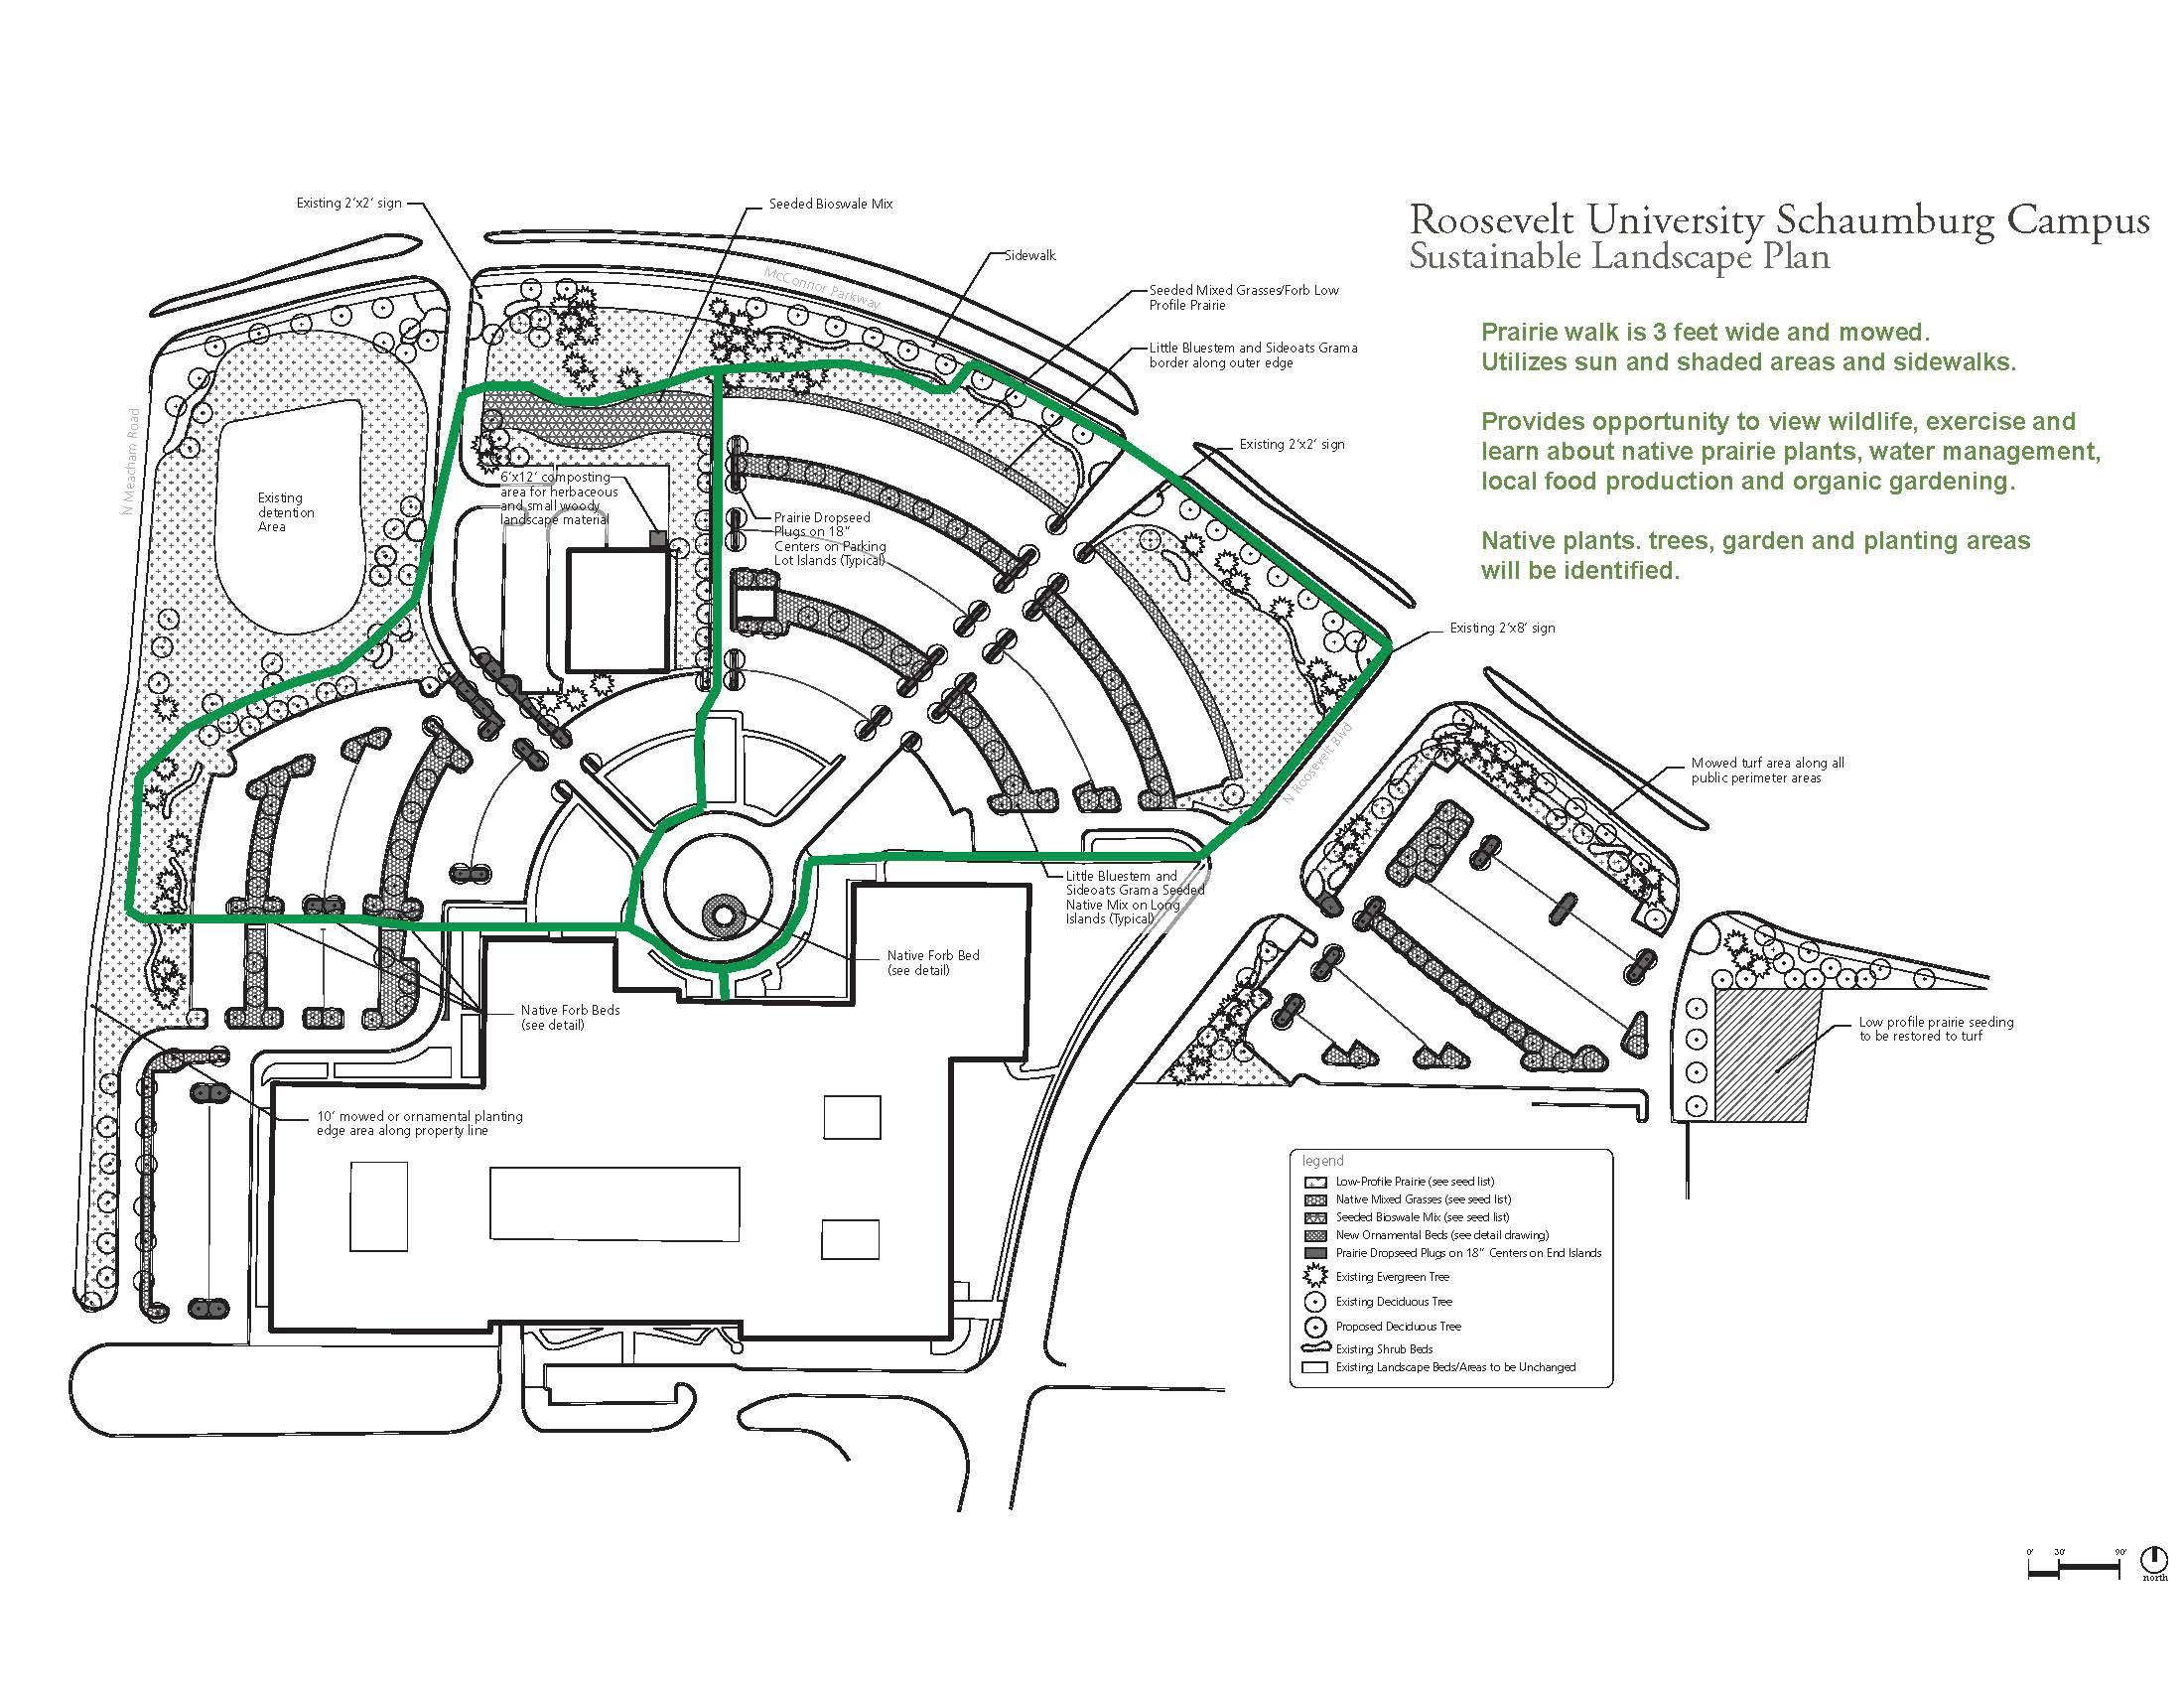 roosevelt university schaumburg campus map Roosevelt University Schaumburg Campus Map Time Zones Map roosevelt university schaumburg campus map